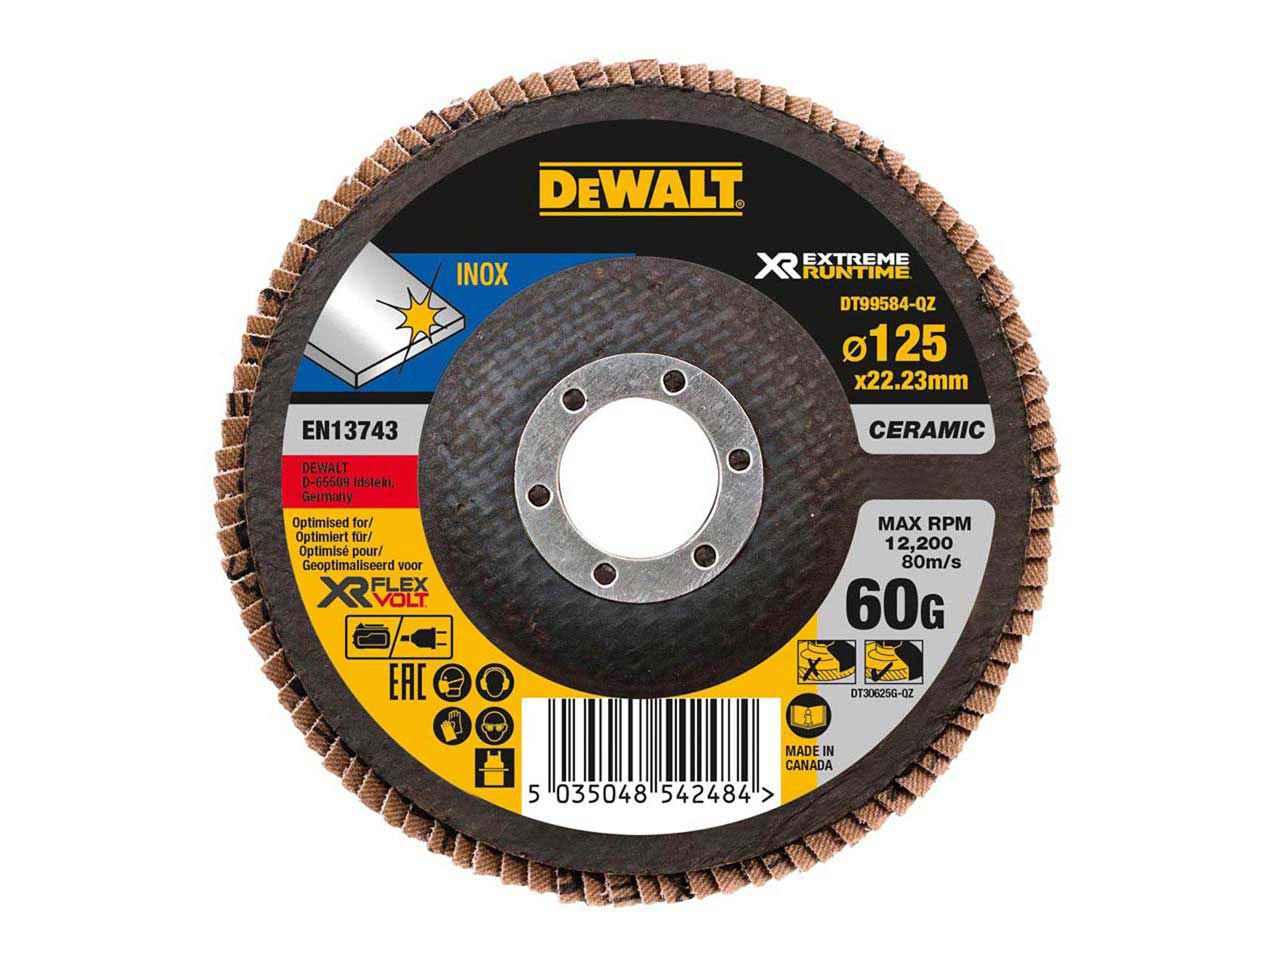 Dewalt DT99564QZ 190mm x 30mm Xtreme Runtime 60T Saw Blade DT99564-QZ